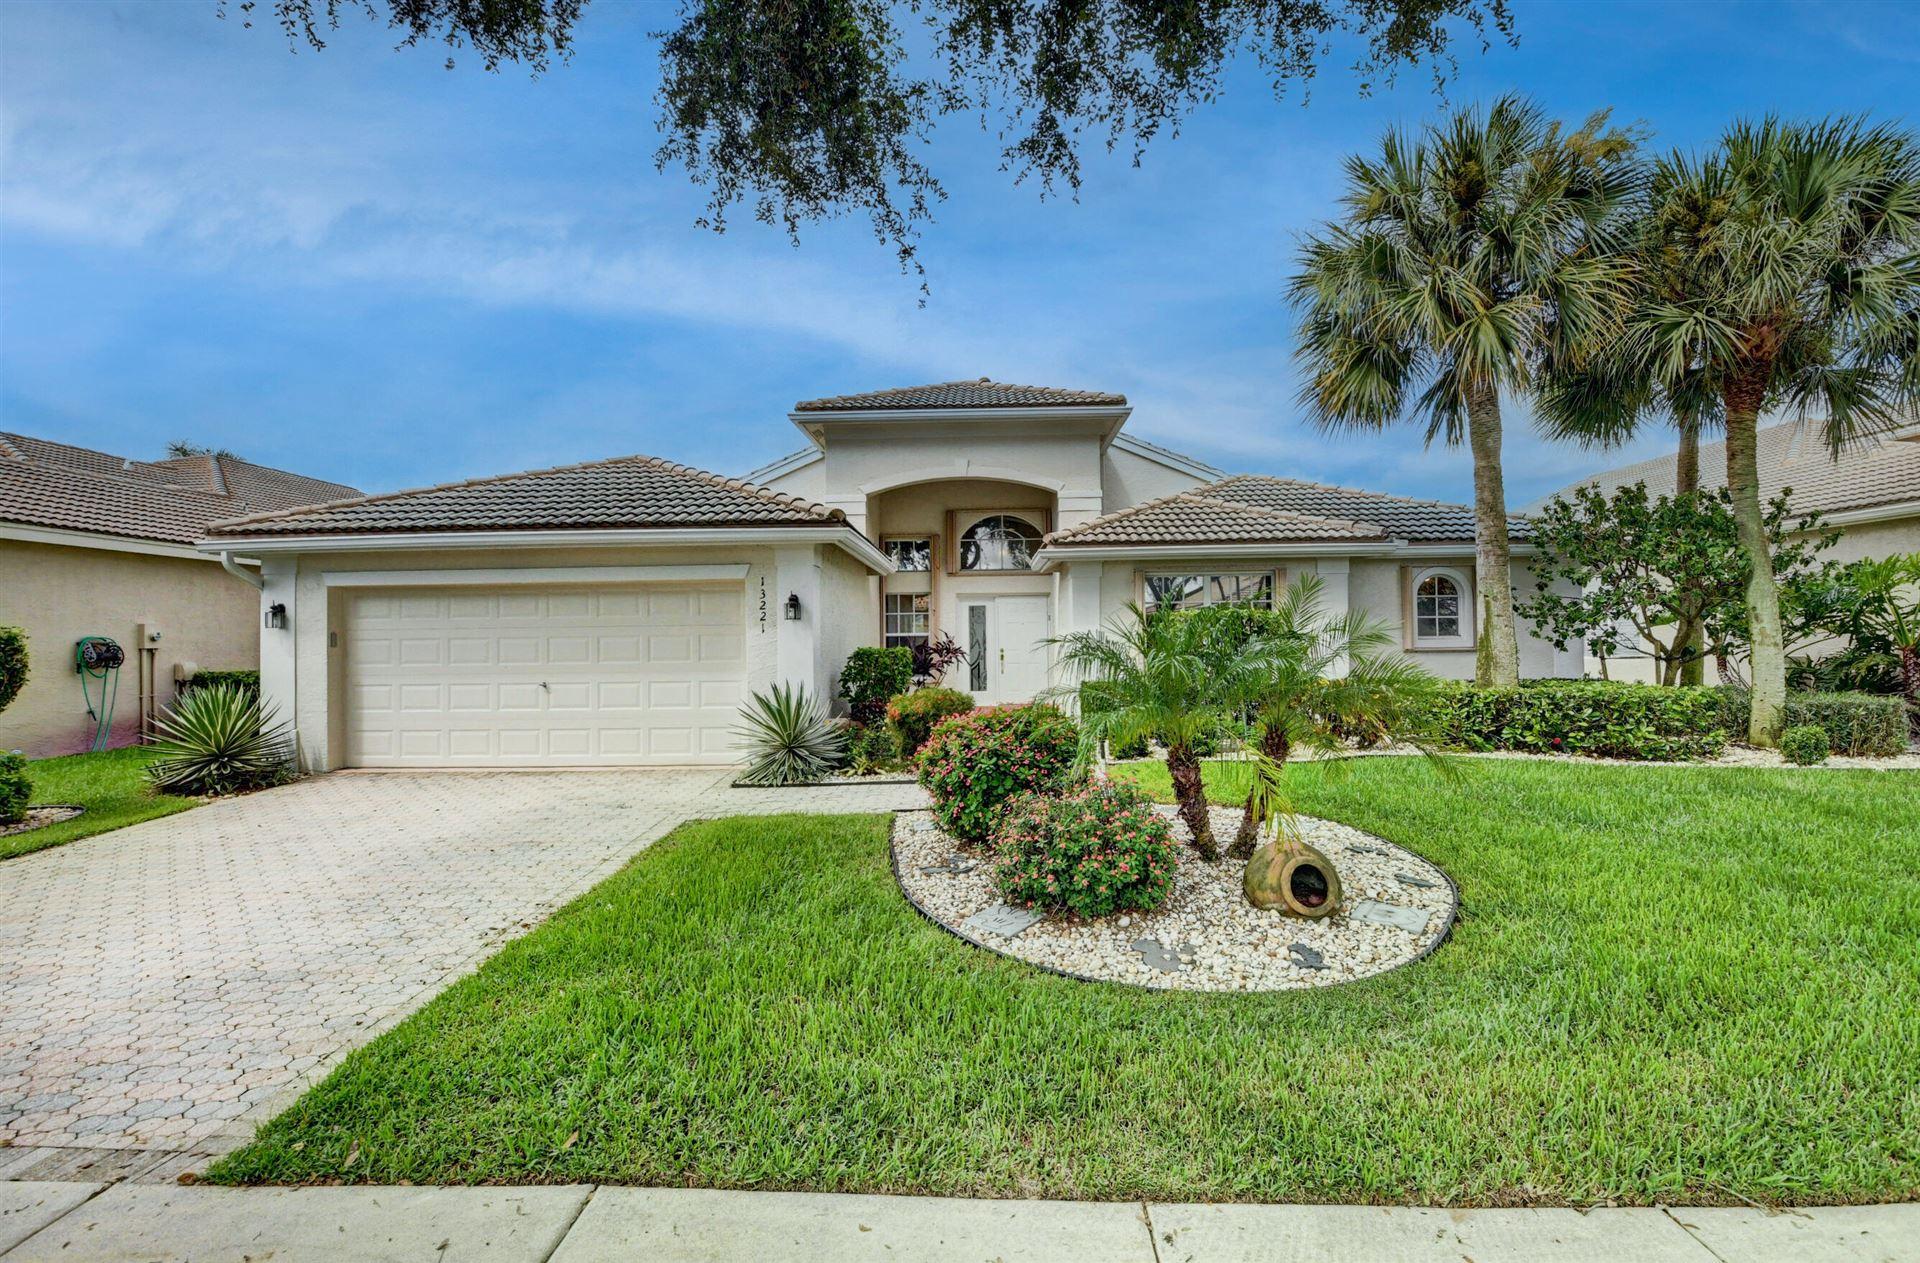 Photo of 13221 Alhambra Lake Circle, Delray Beach, FL 33446 (MLS # RX-10746321)